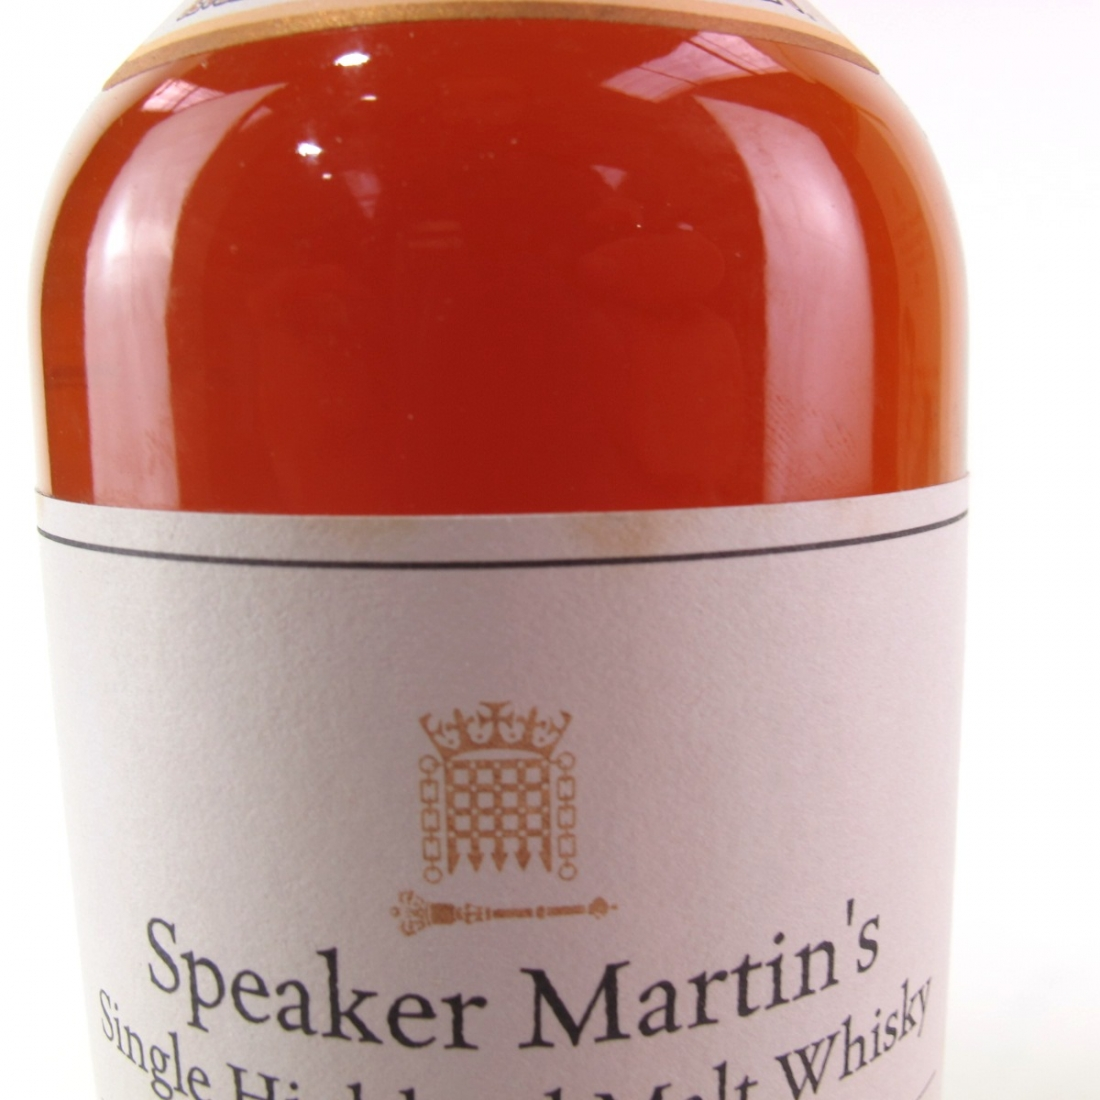 Macallan 10 Year Old Speaker Martin's